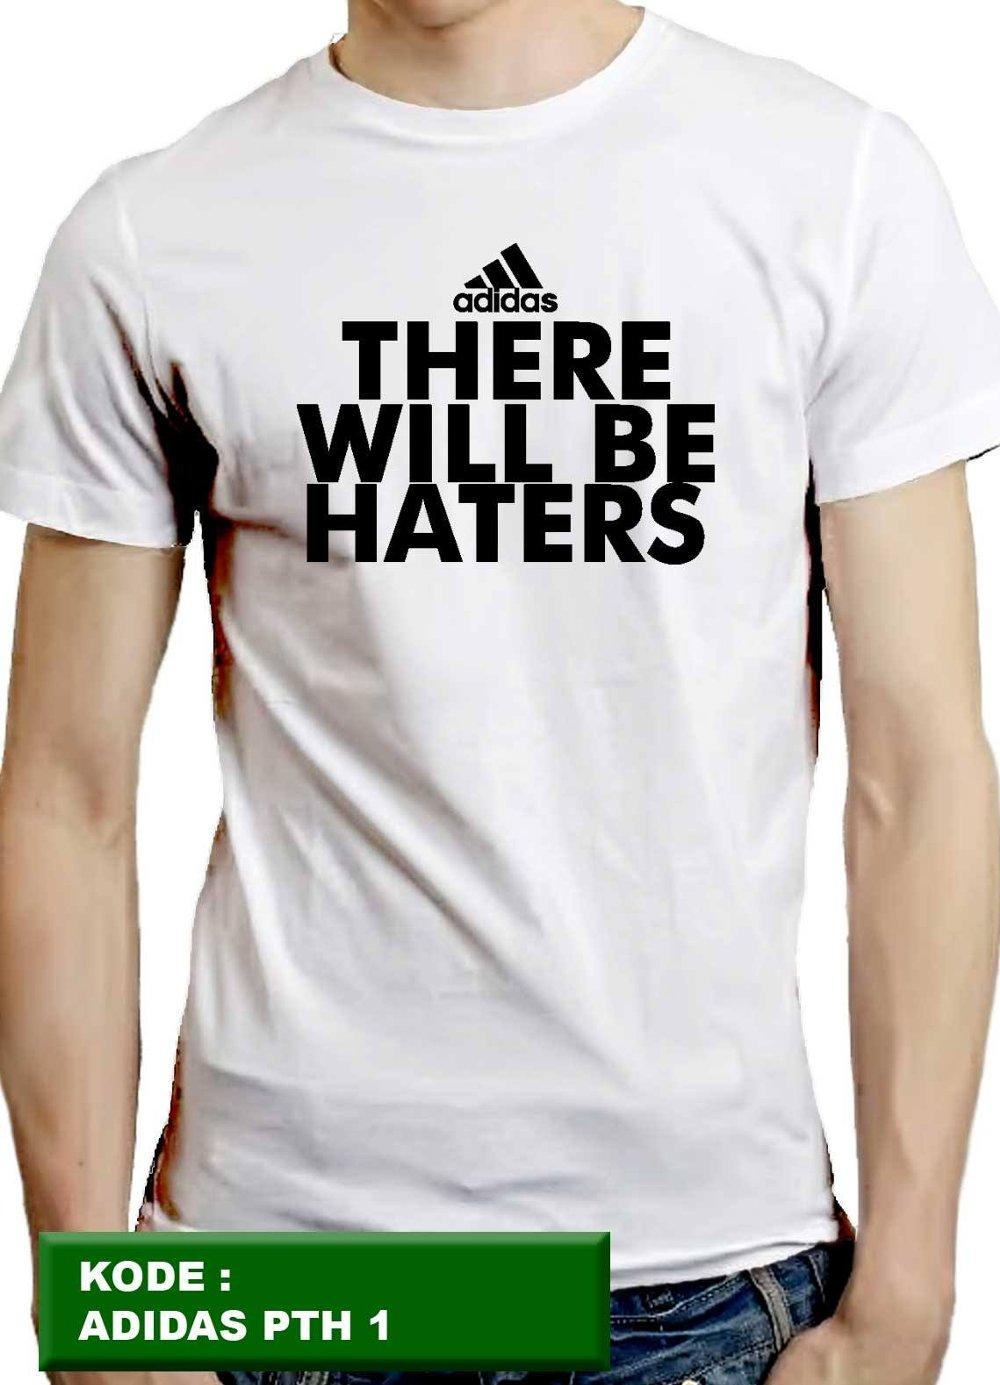 kaos adidas, kaos pria, kaos cowok, kaos distro, t-shirt, putih 1, there will be haters, jeryhansen di lapak jeryhansen jeryhansen